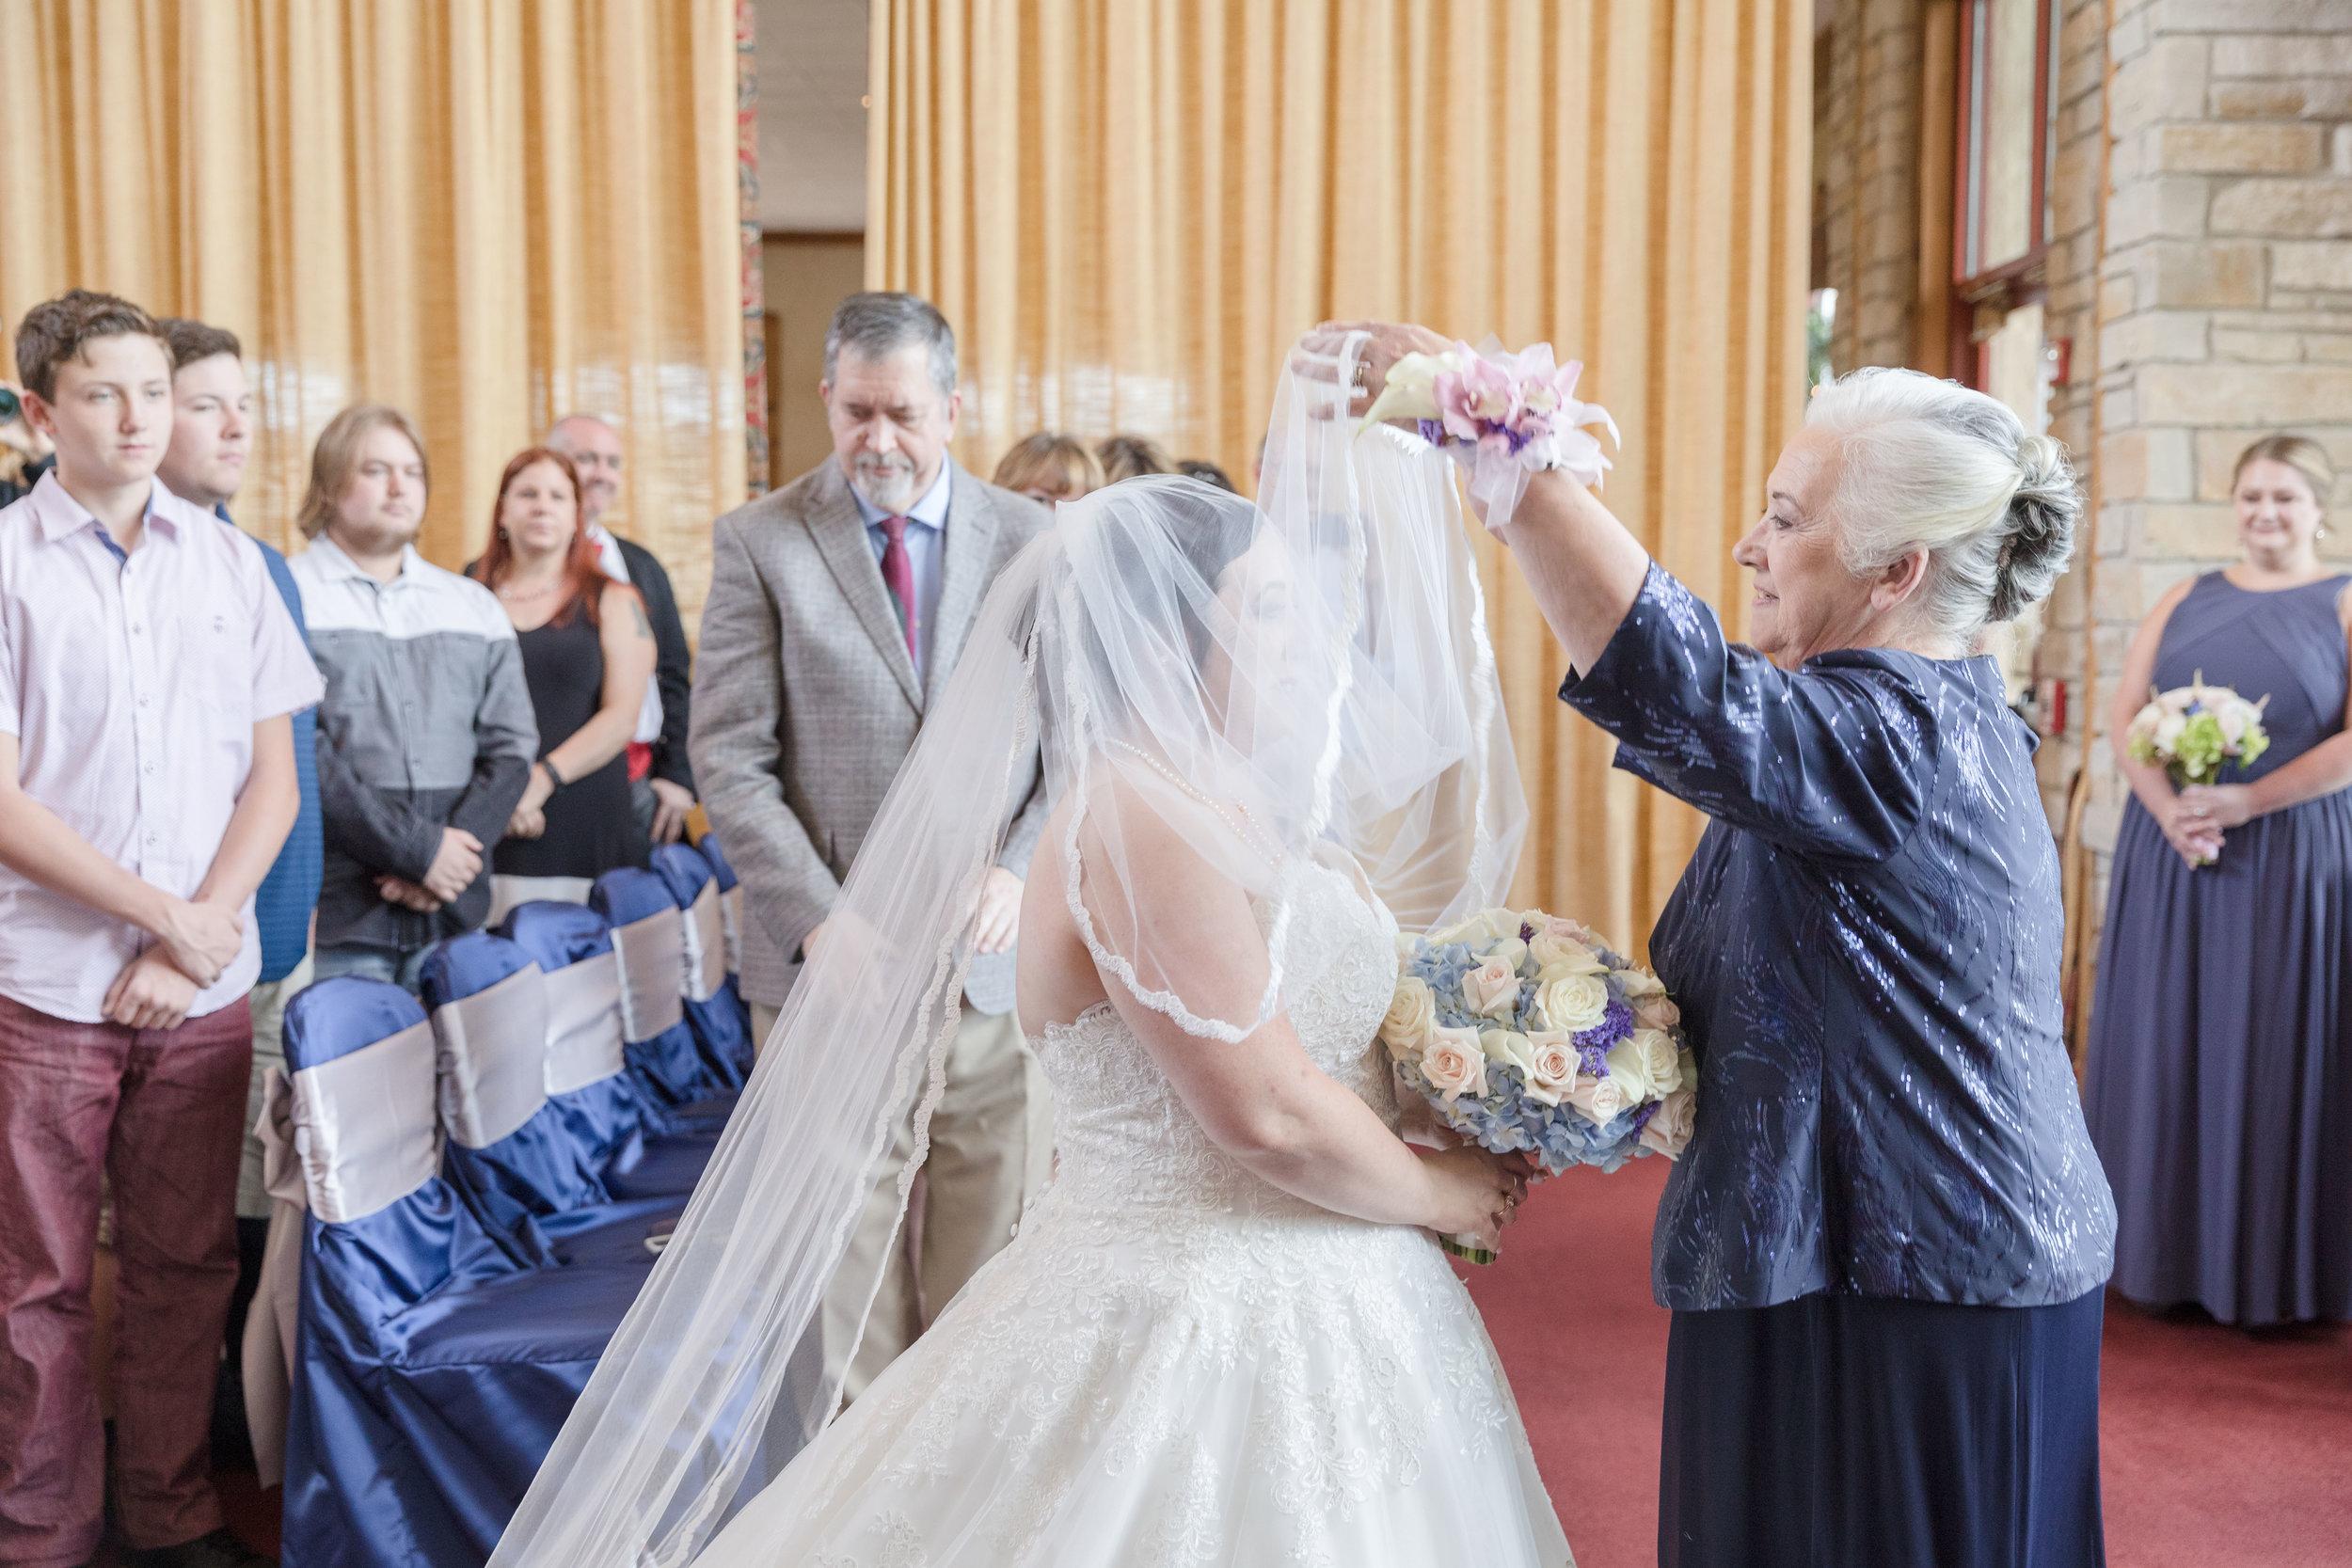 JVaughn_Photography_Weddings_Huntley_Photographer_Professional_Wedding0325.jpg